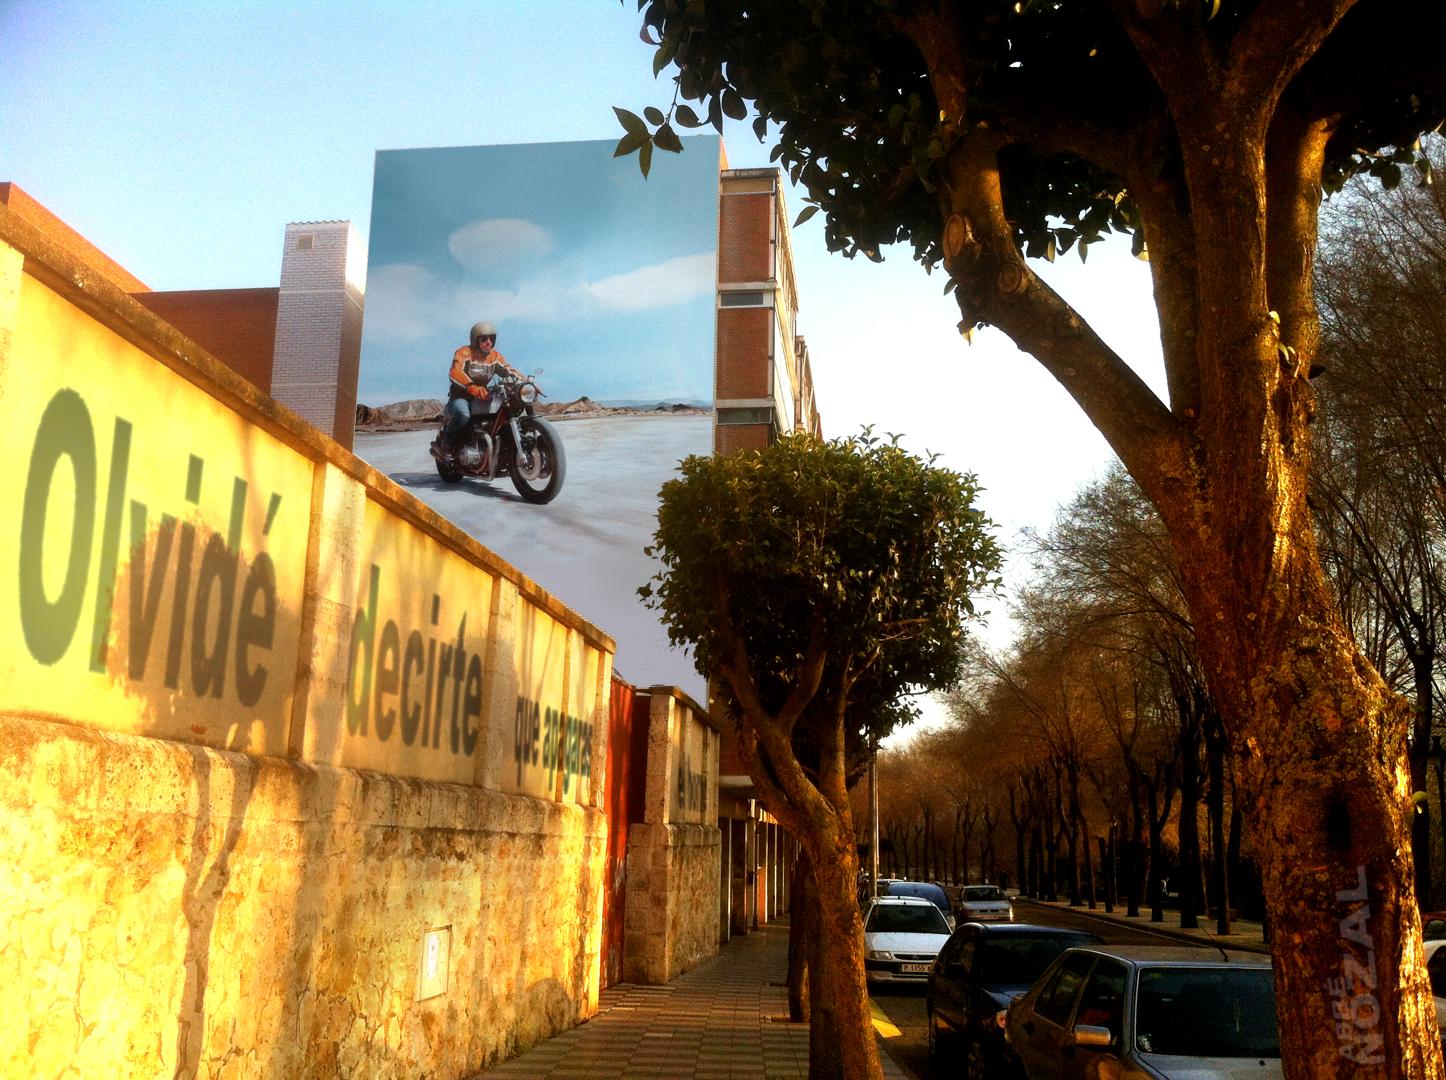 Jimmy en moto, 2014 Abbé Nozal